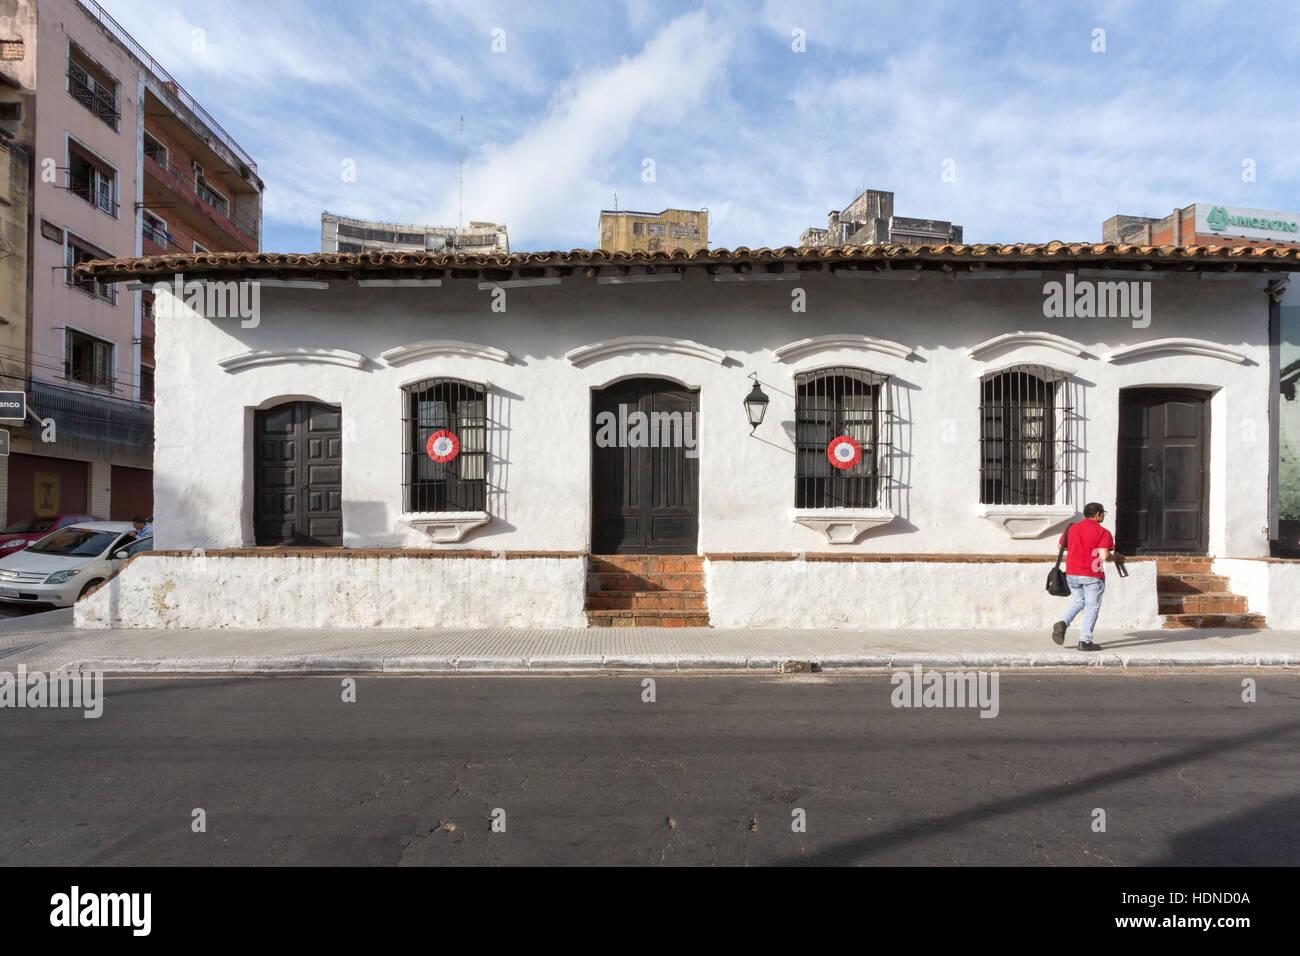 Paraguay Colonial Building In Asuncion Stock Photos & Paraguay ...